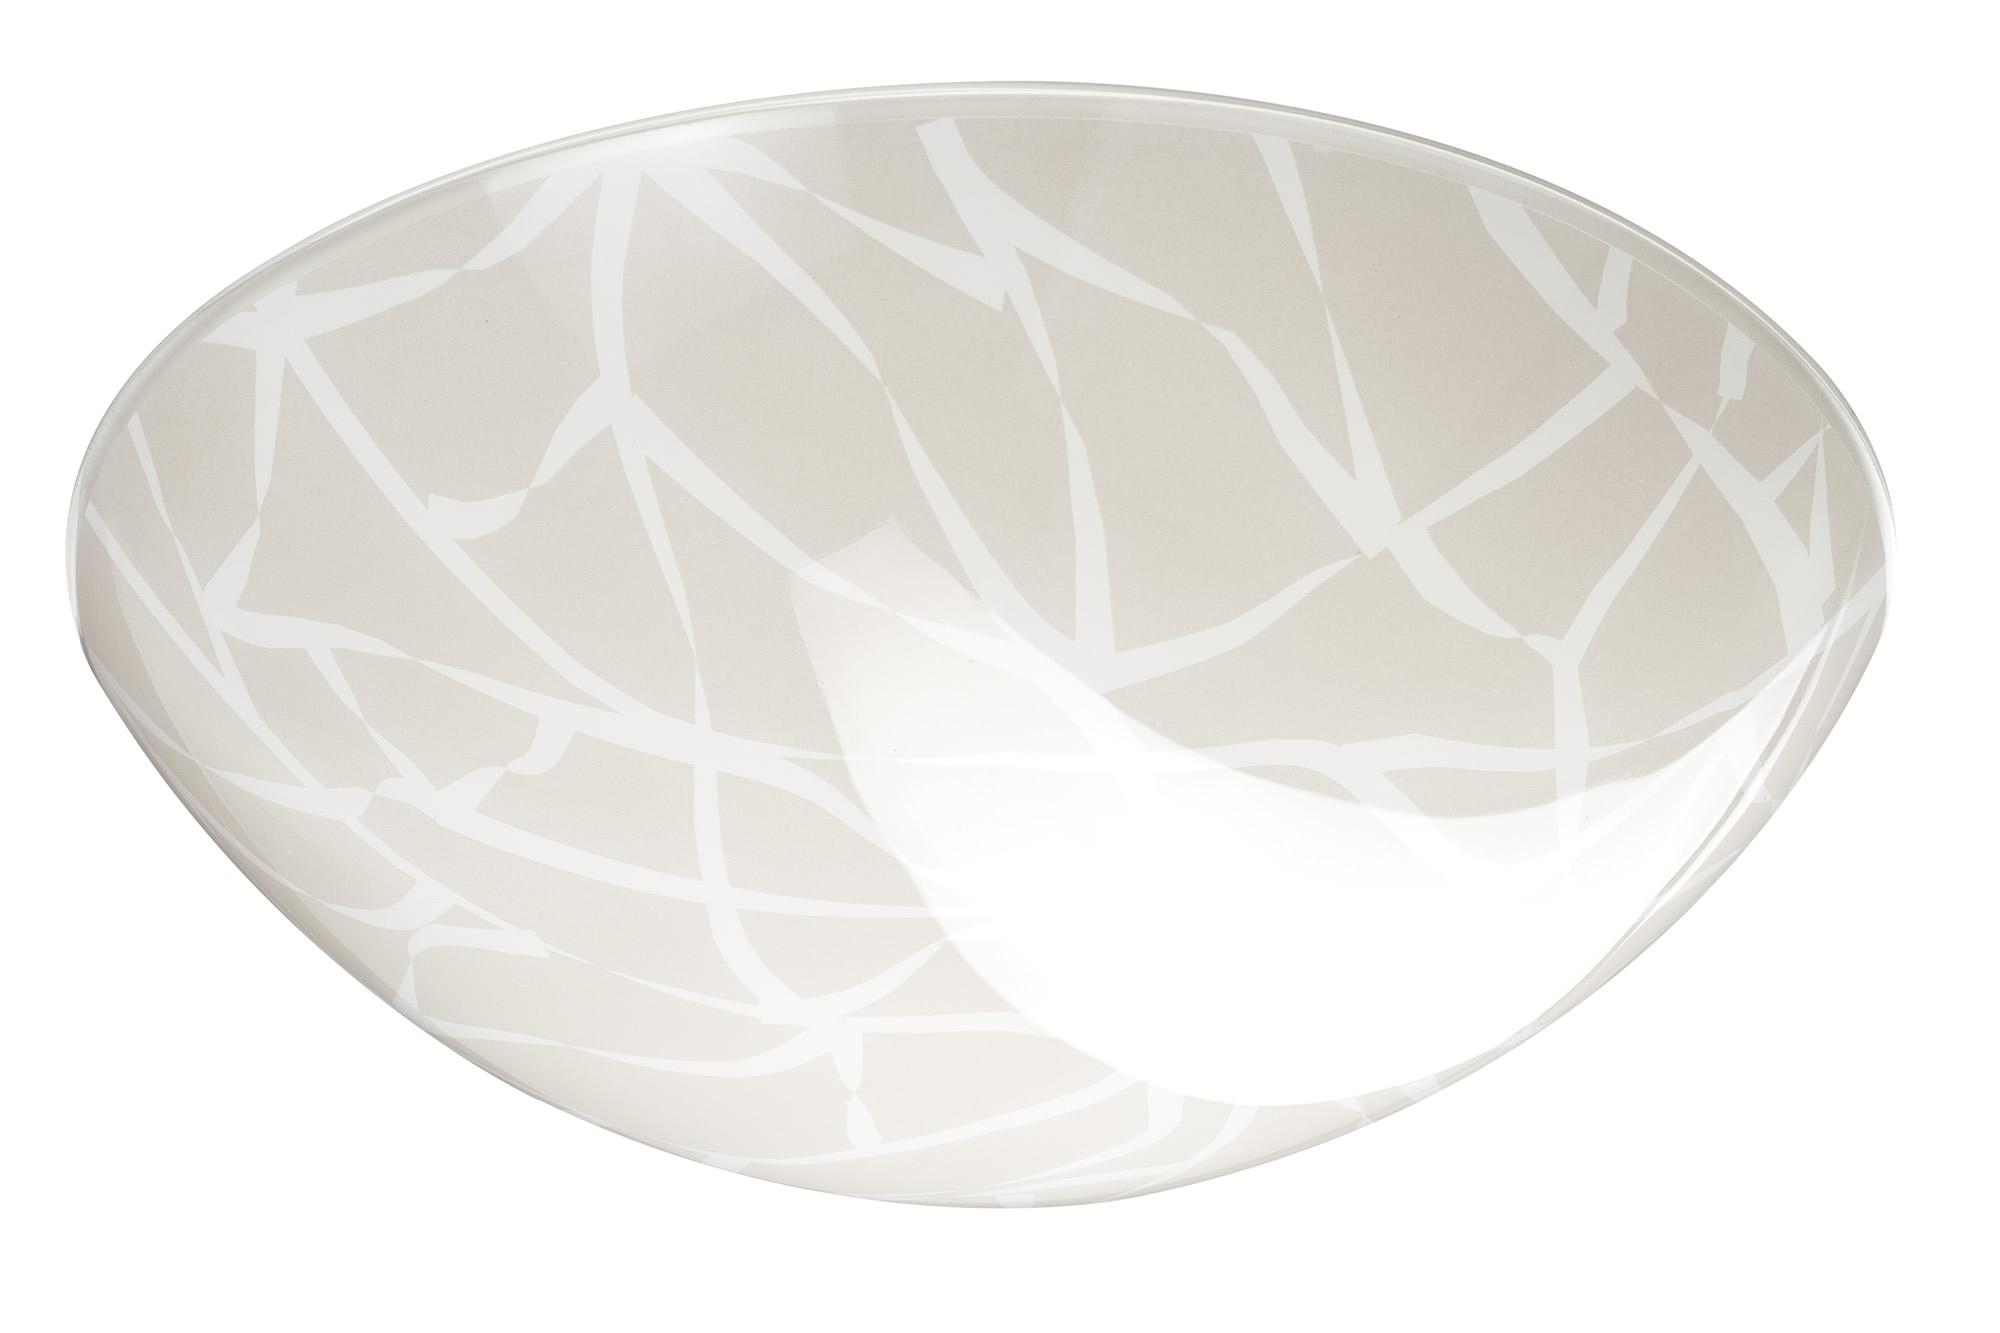 Paulmann. 70237 Плафон Circle Branches, стекло, 295мм